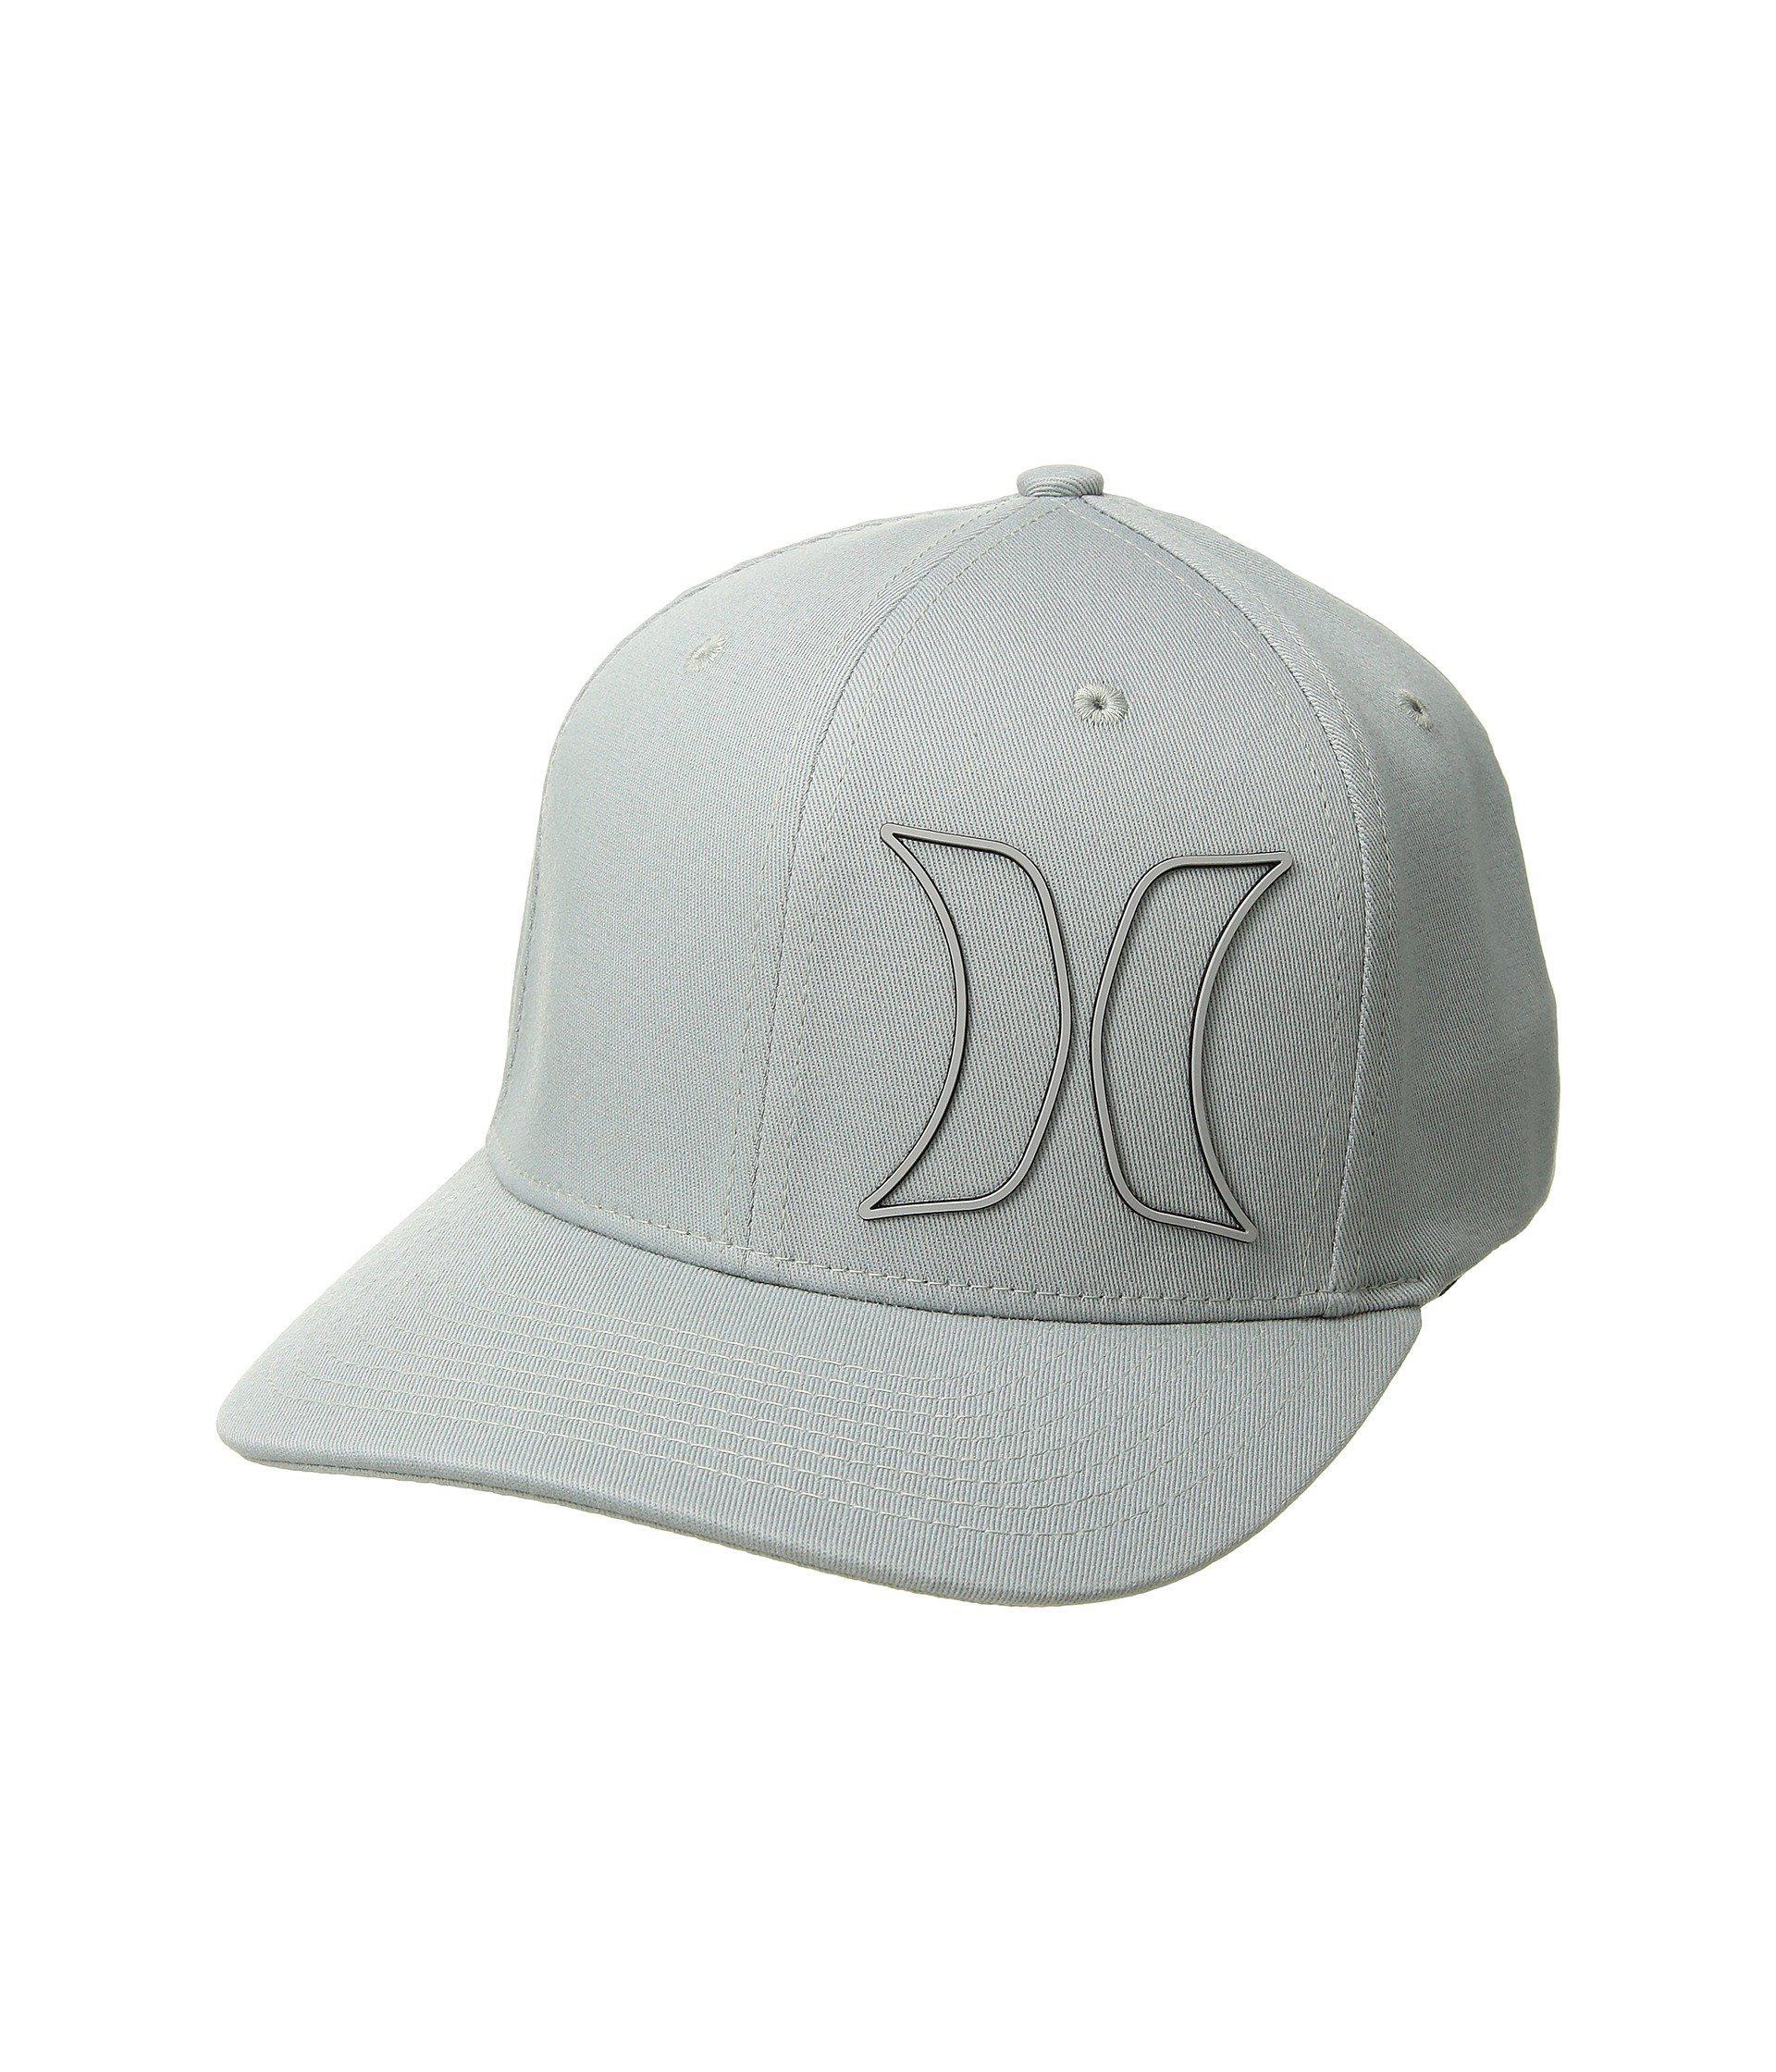 9917508ee51 Lyst - Hurley Santa Barbara Hat (black) Caps in Gray for Men